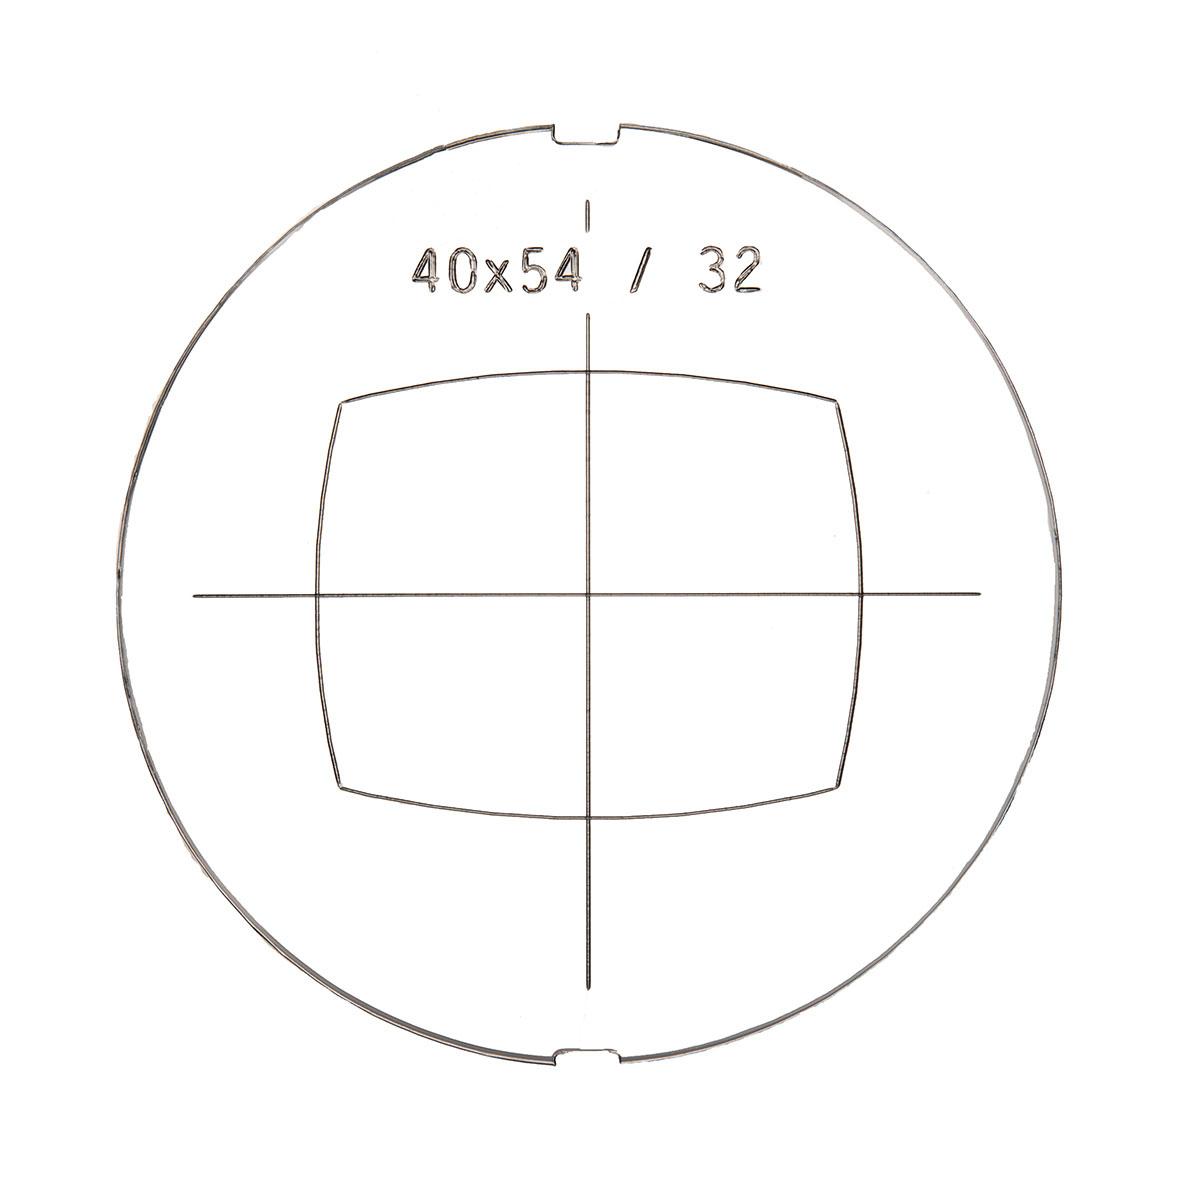 ALPA viewfinder standard masks